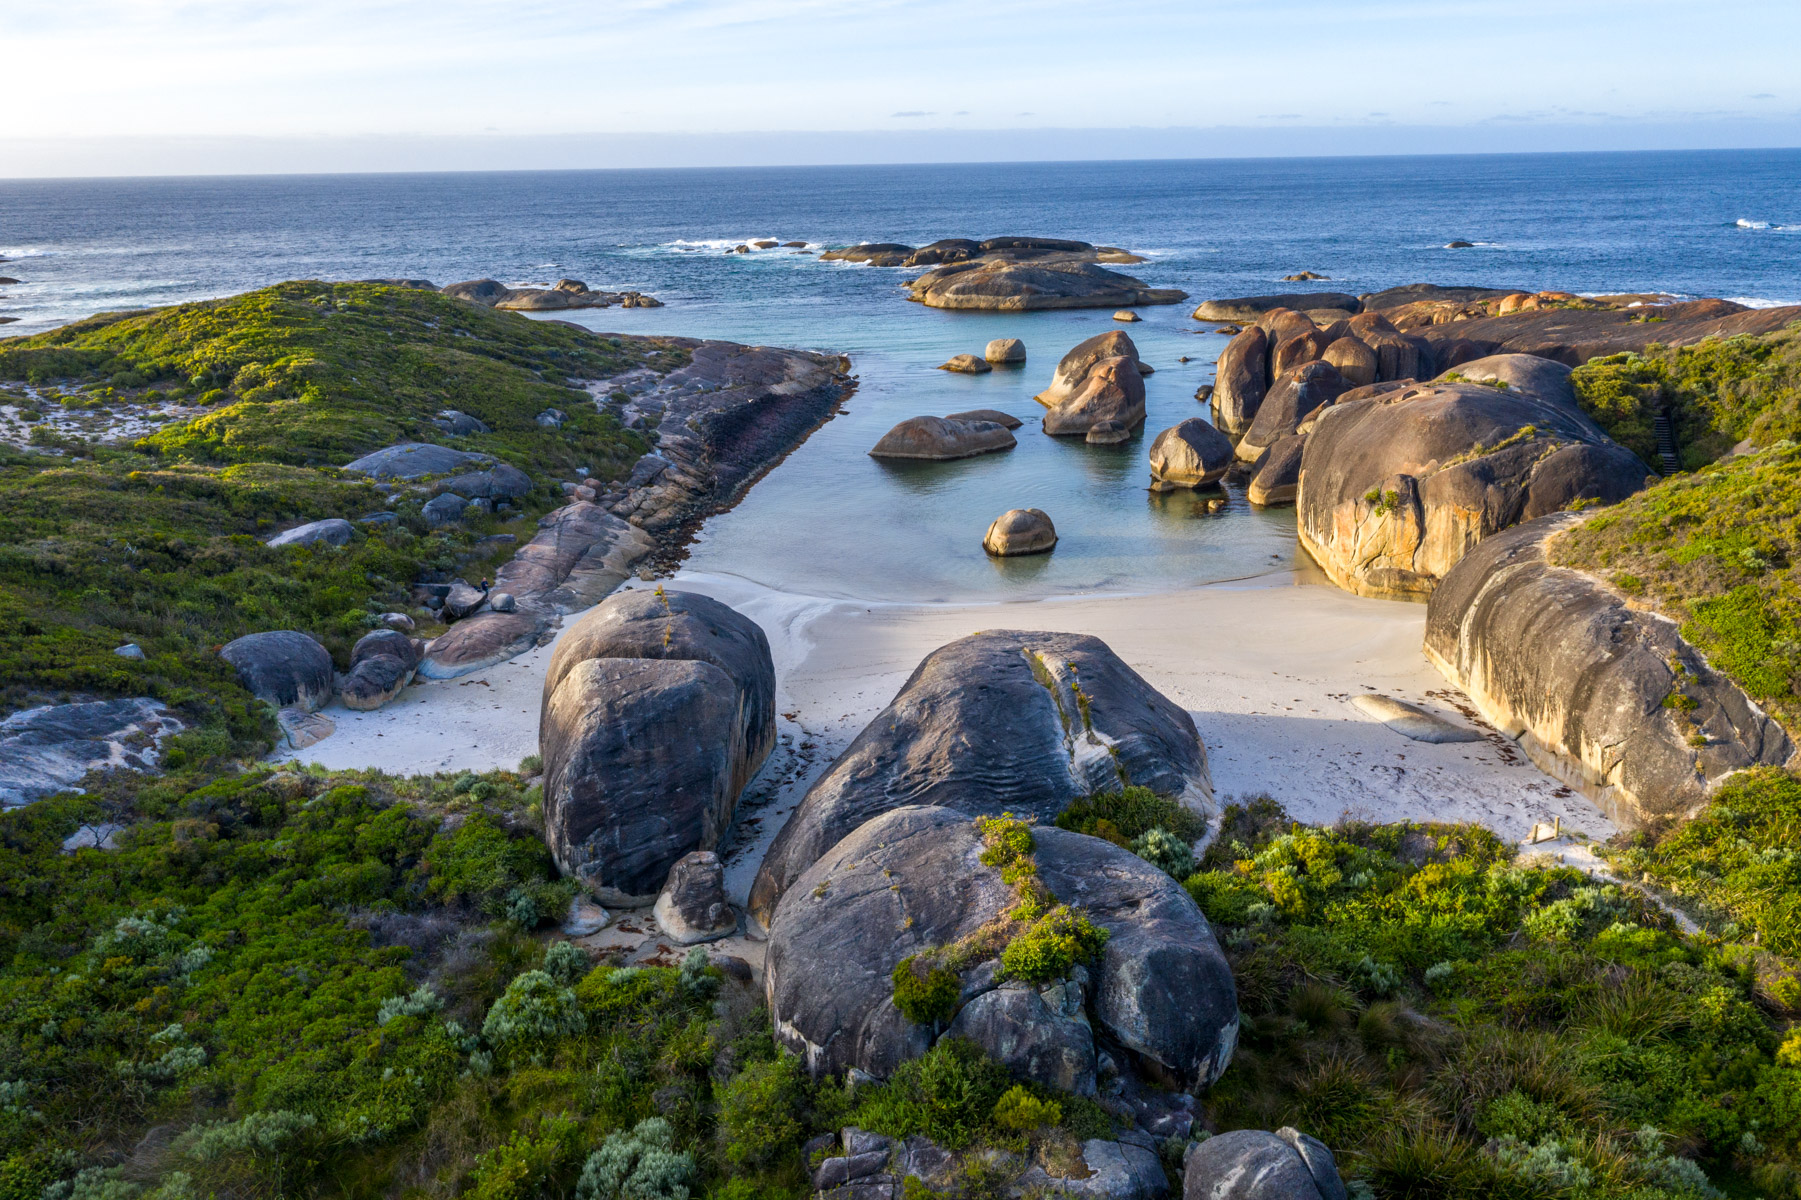 Elephant Rocks Denmark Western Australia, Australia